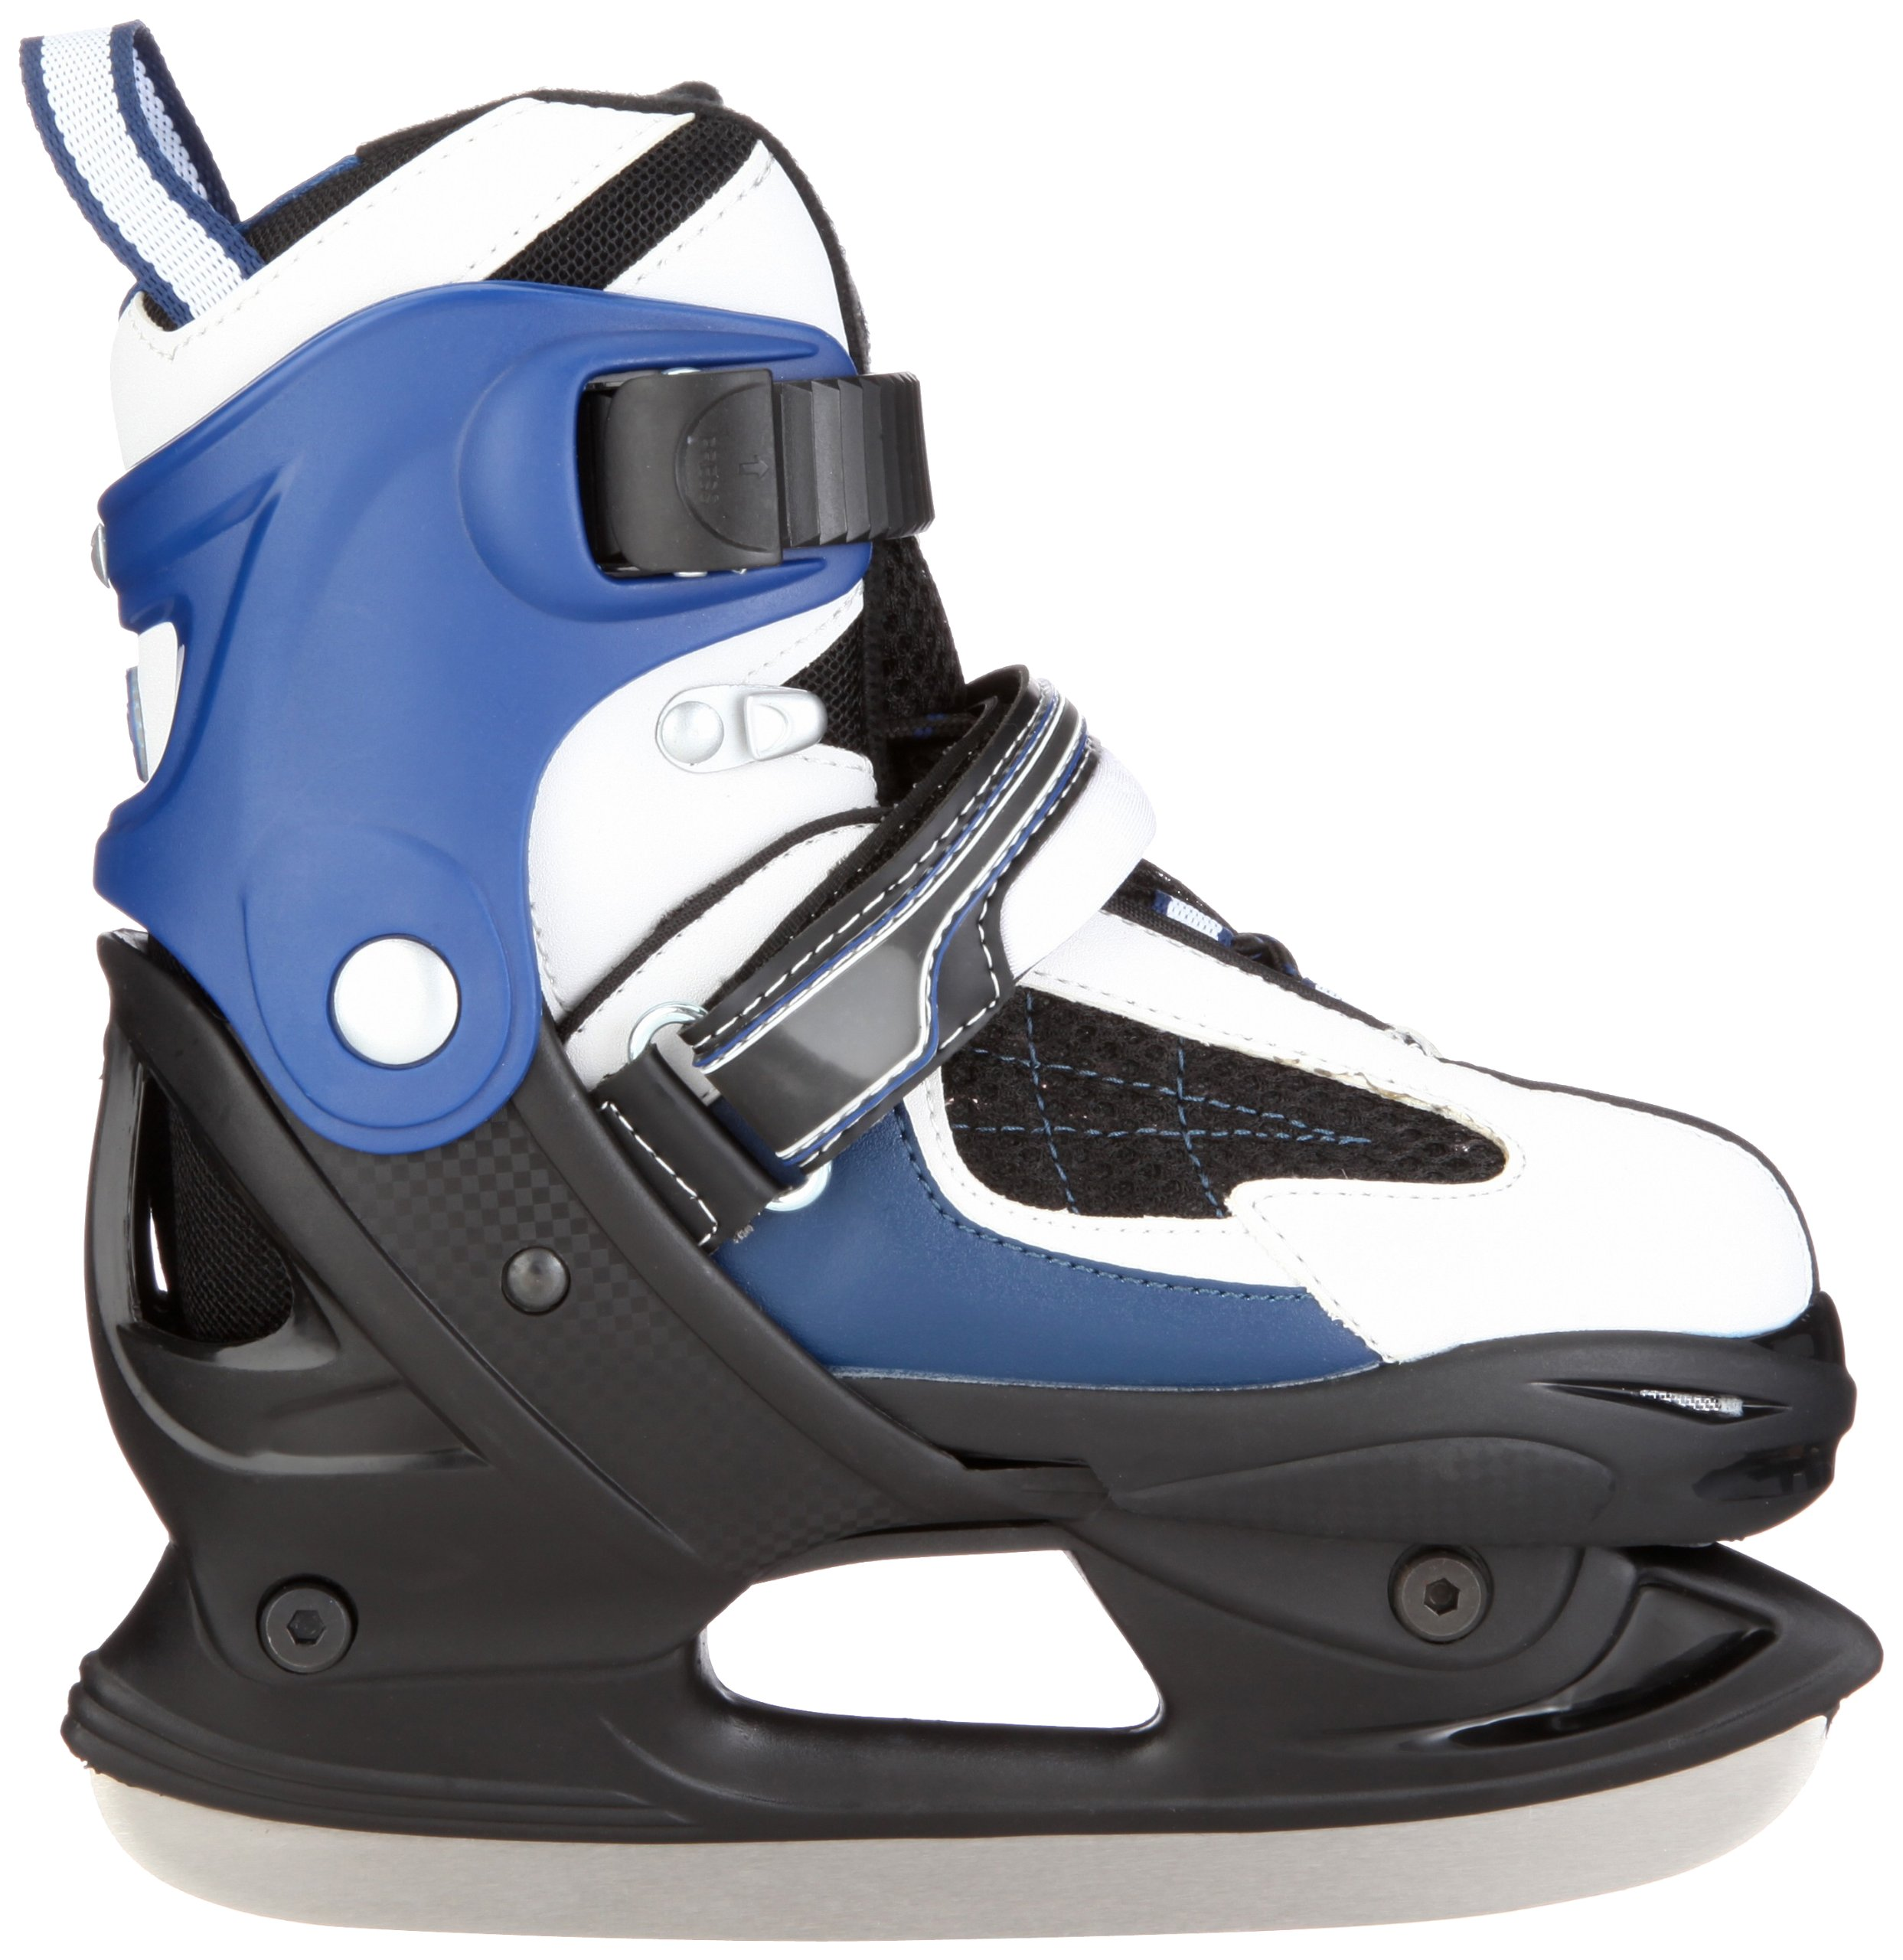 HUDORA ''HD 2010'' Ice Skates Set, Size 4-6, 5, Blue